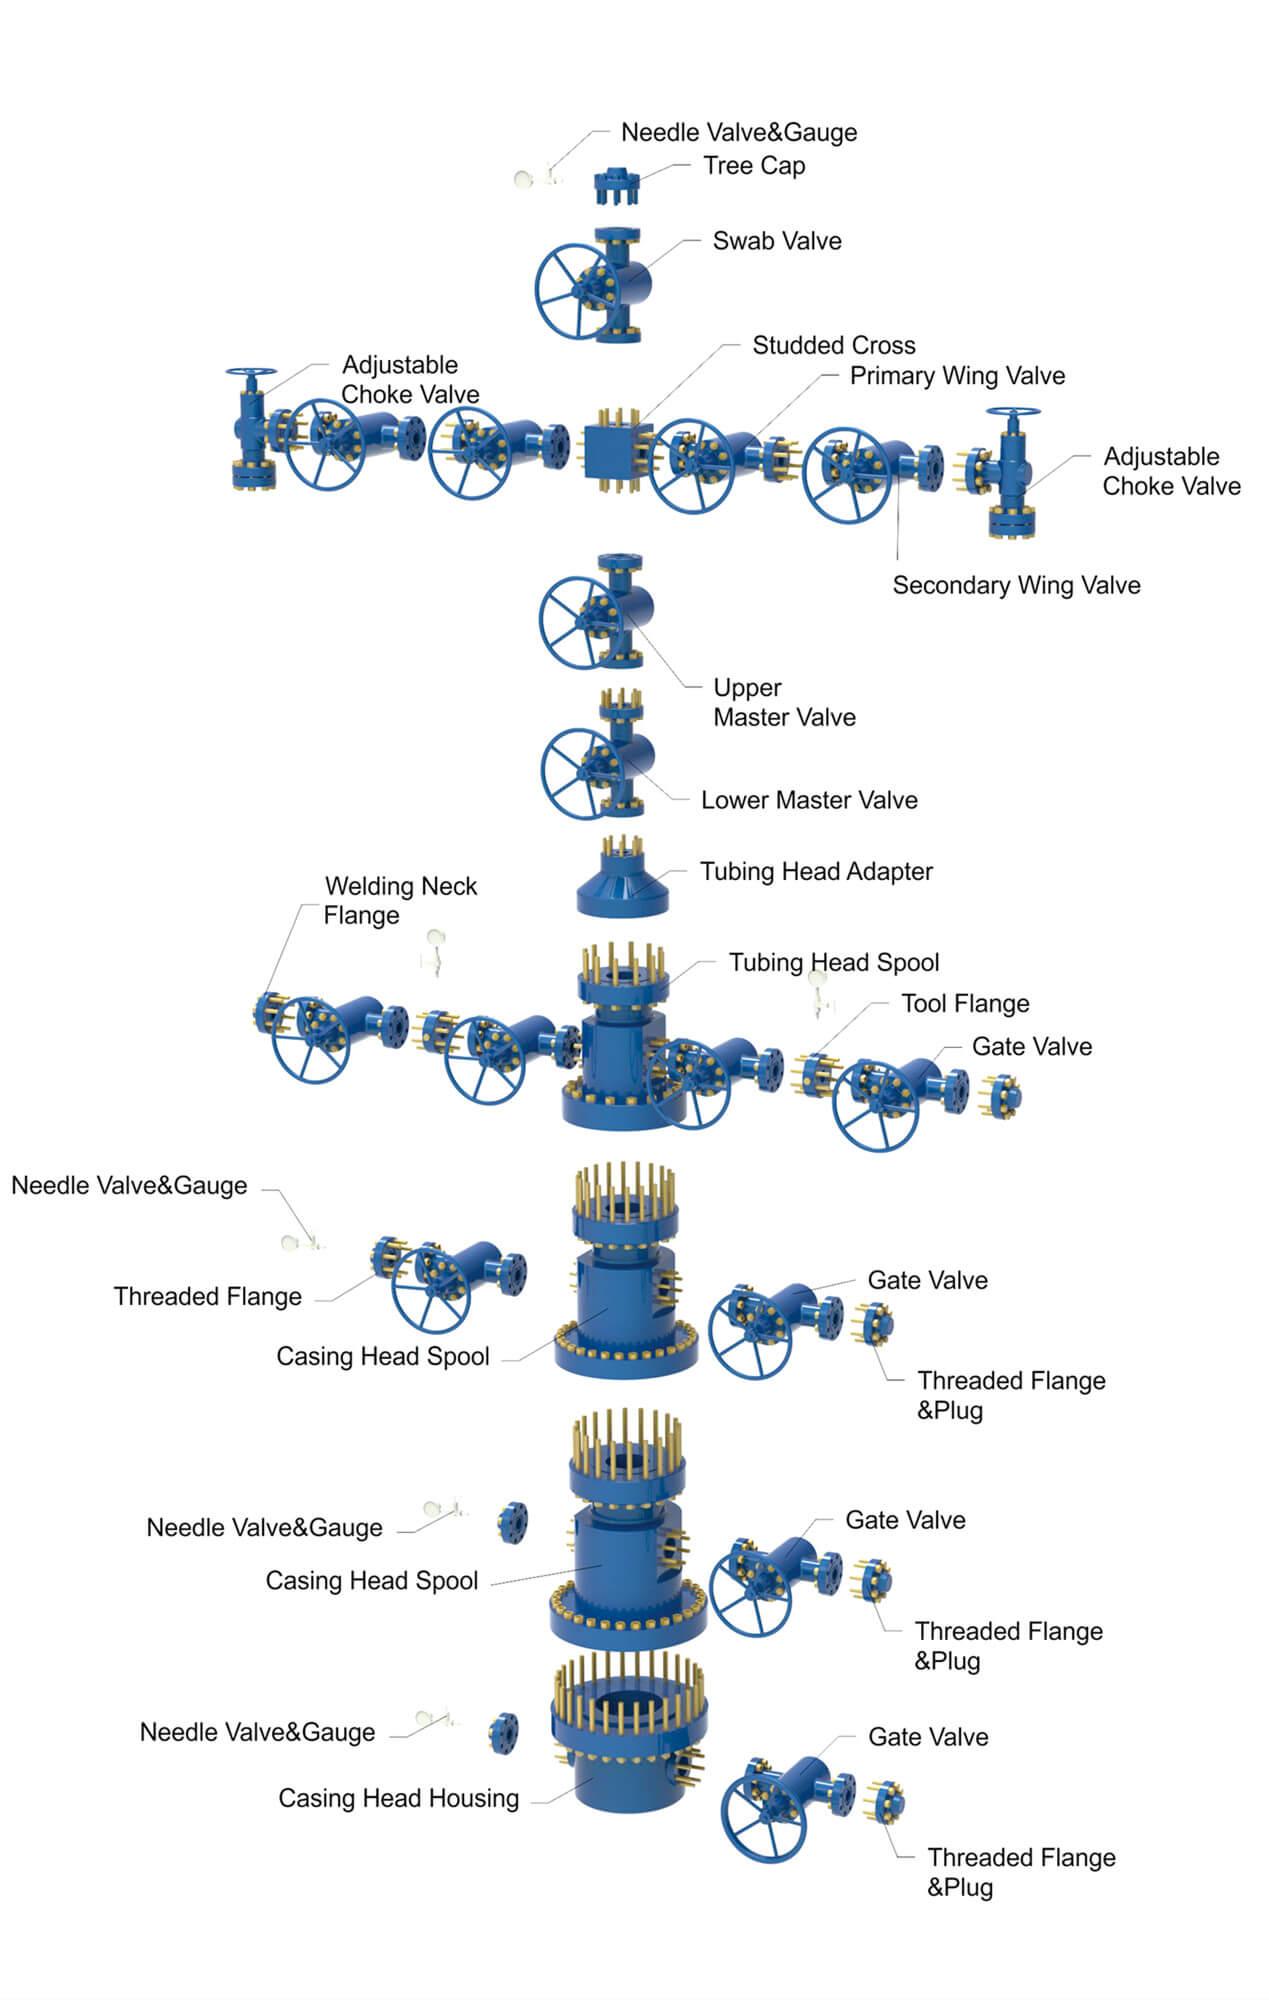 https://hcpetroleum.hk/imgs/products/wellhead_X-mas_tree_HC_Petroleum_Equipment_4.jpg